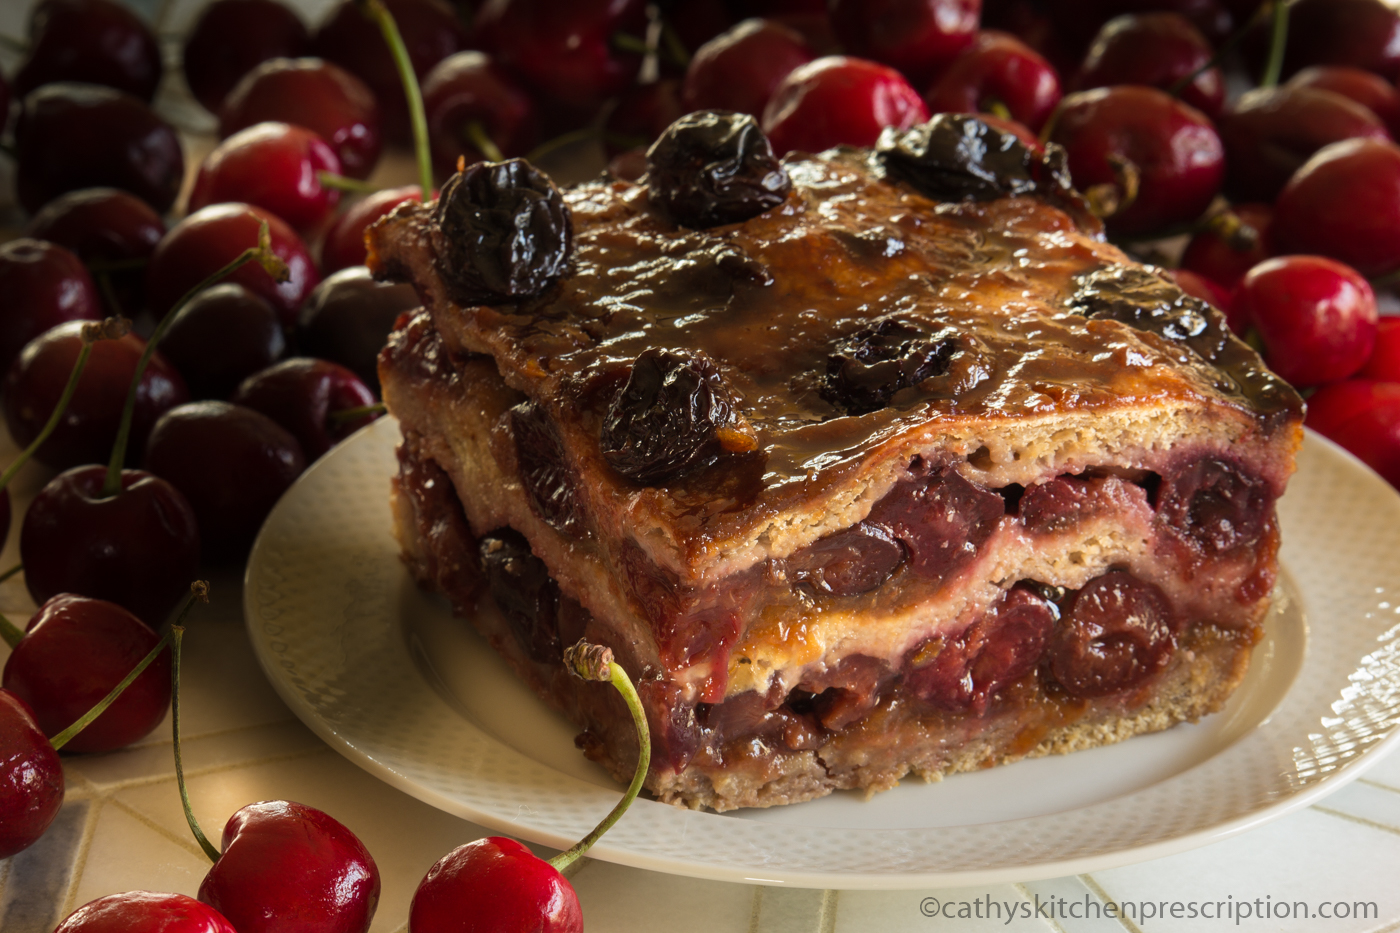 Rustic cherry torte